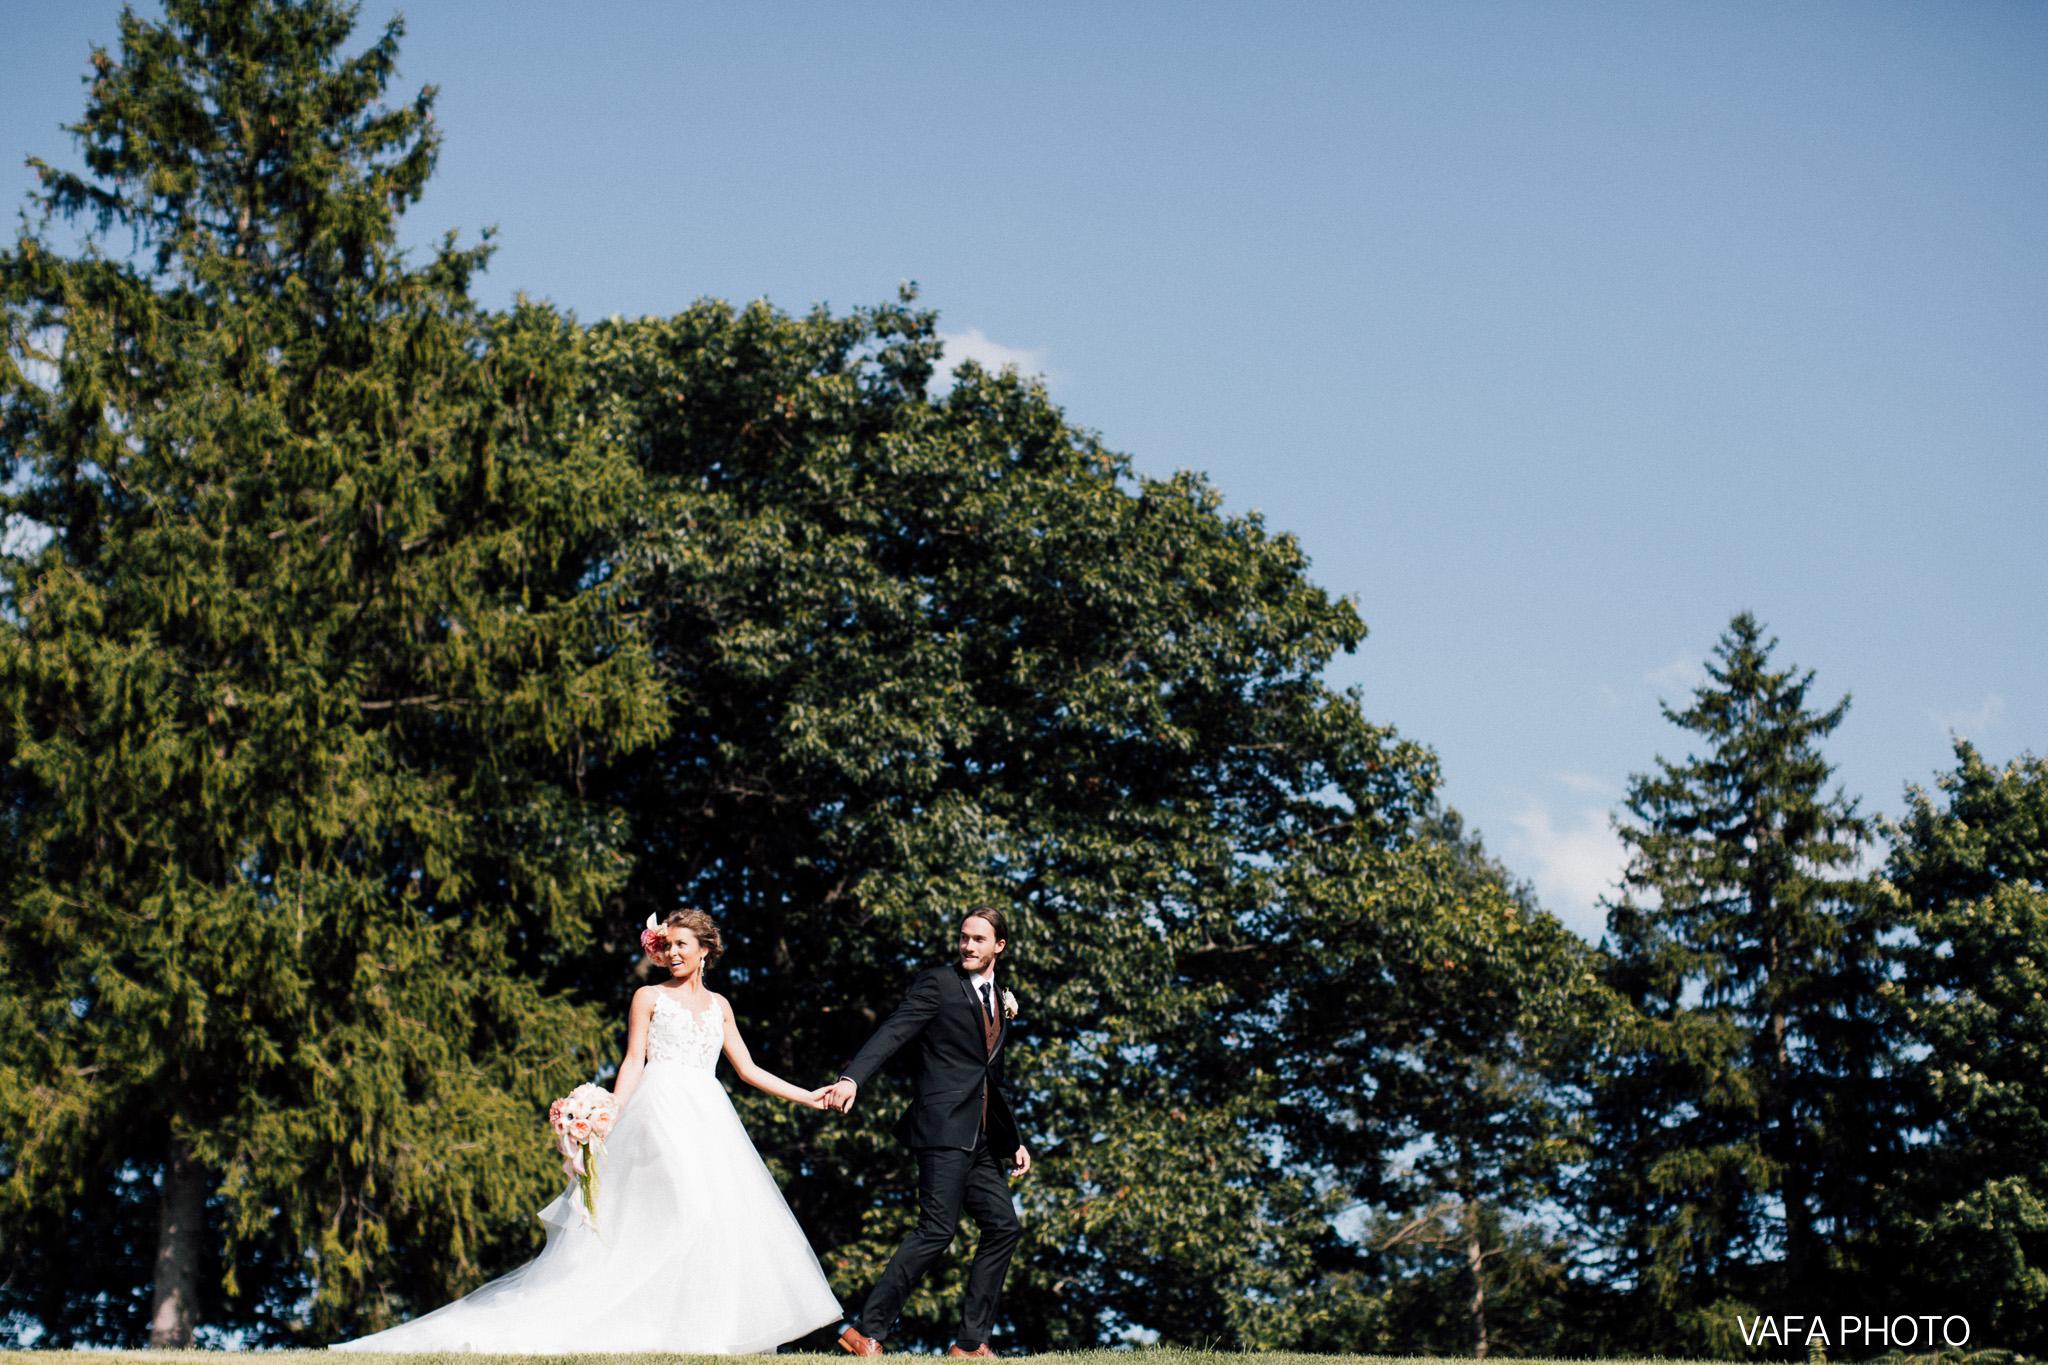 The-Felt-Estate-Wedding-Kailie-David-Vafa-Photo-604.jpg